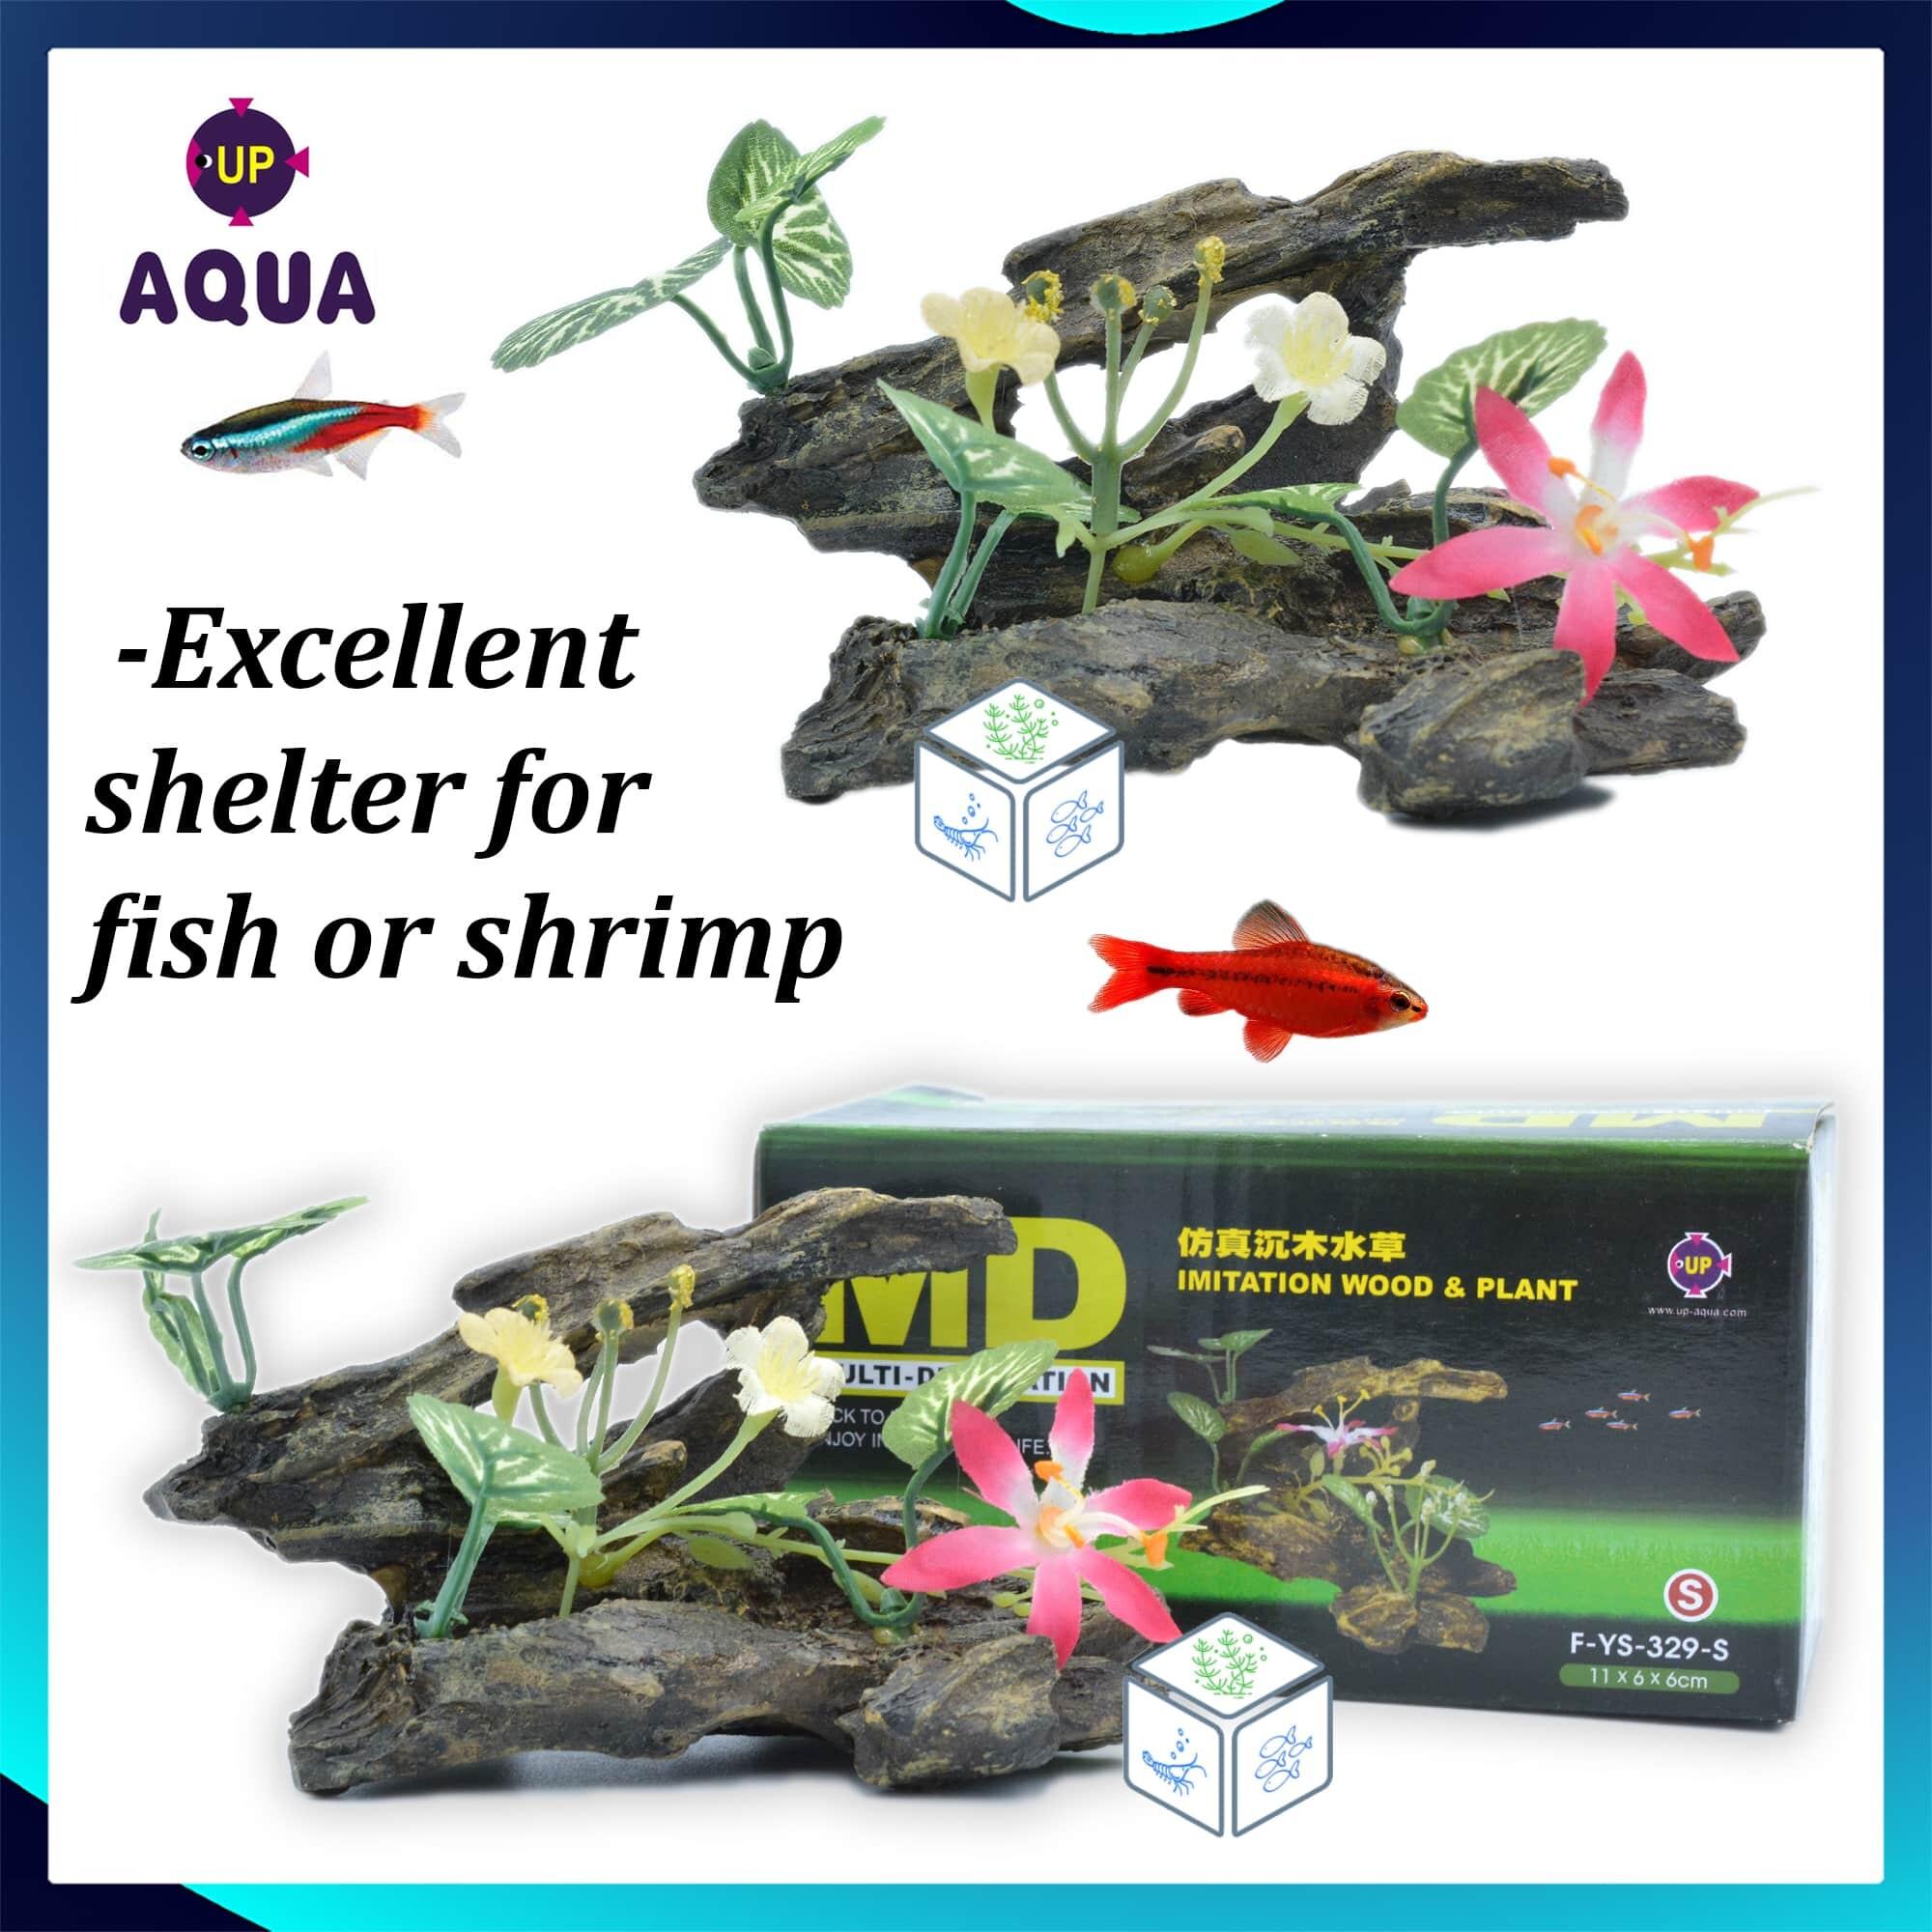 Aquarium Decoration Wood Plant Imitation FYS329-S